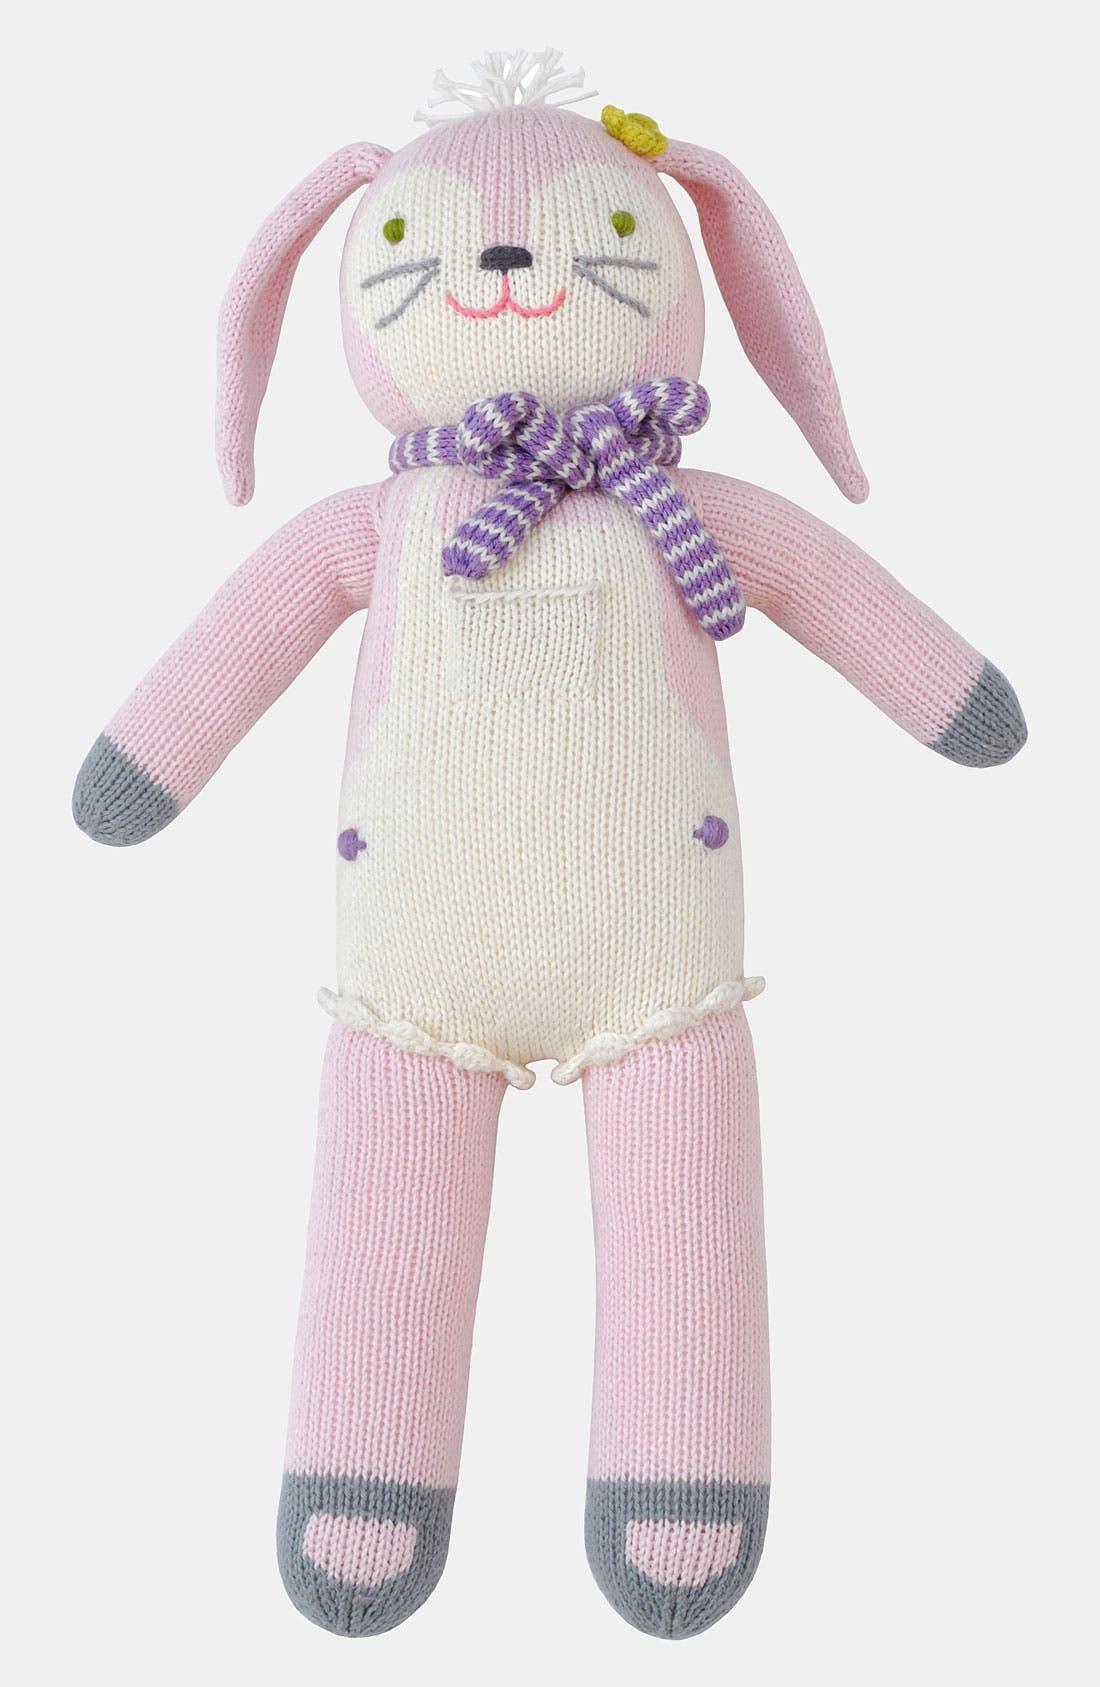 Main Image - Blabla 'Fleur the Bunny' Knit Doll